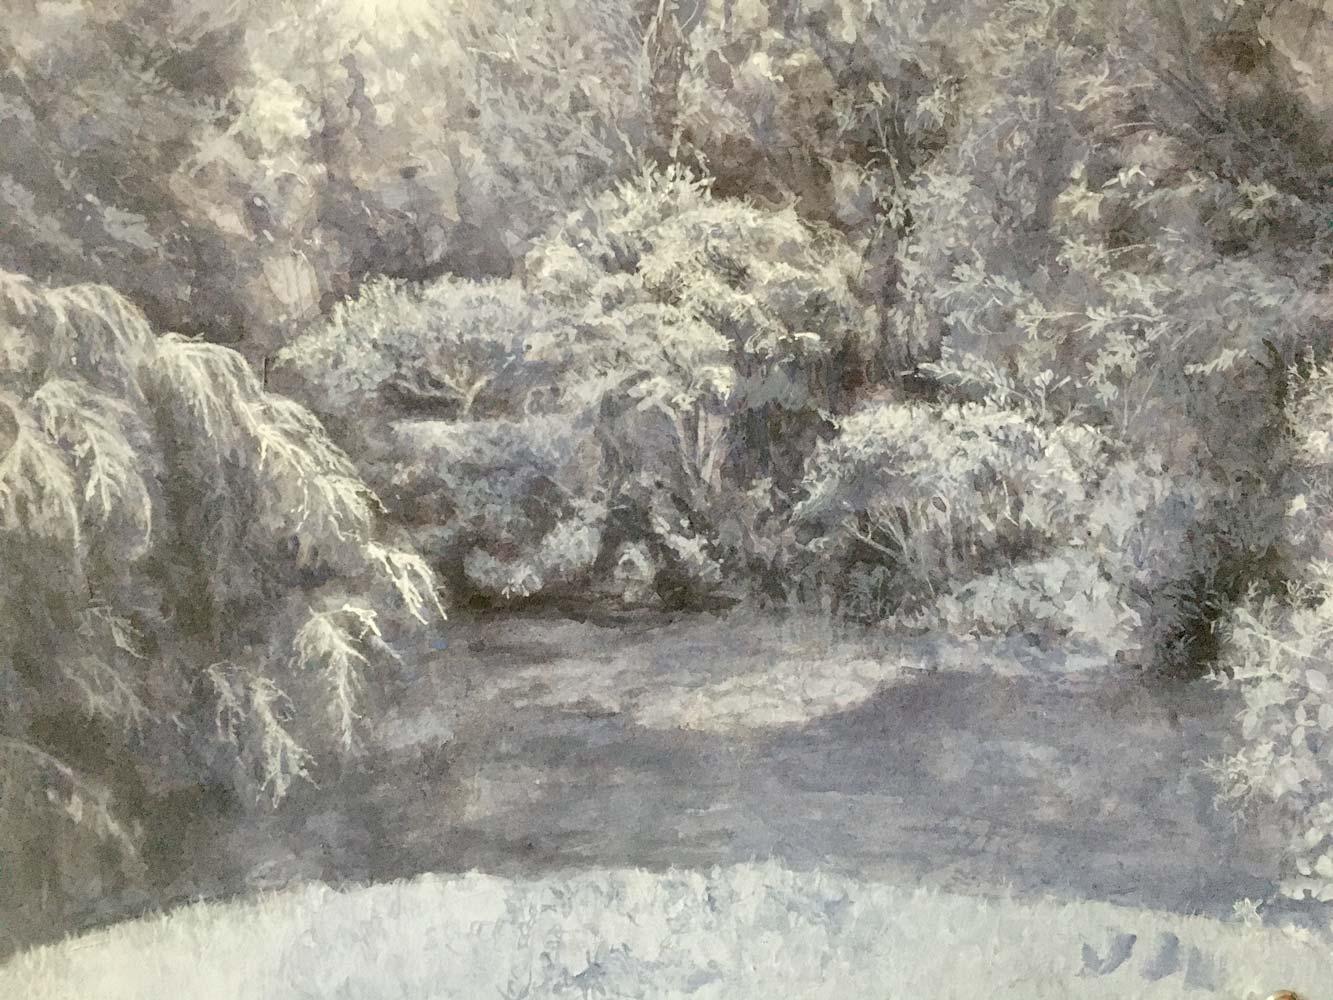 Monochromatic Landscape